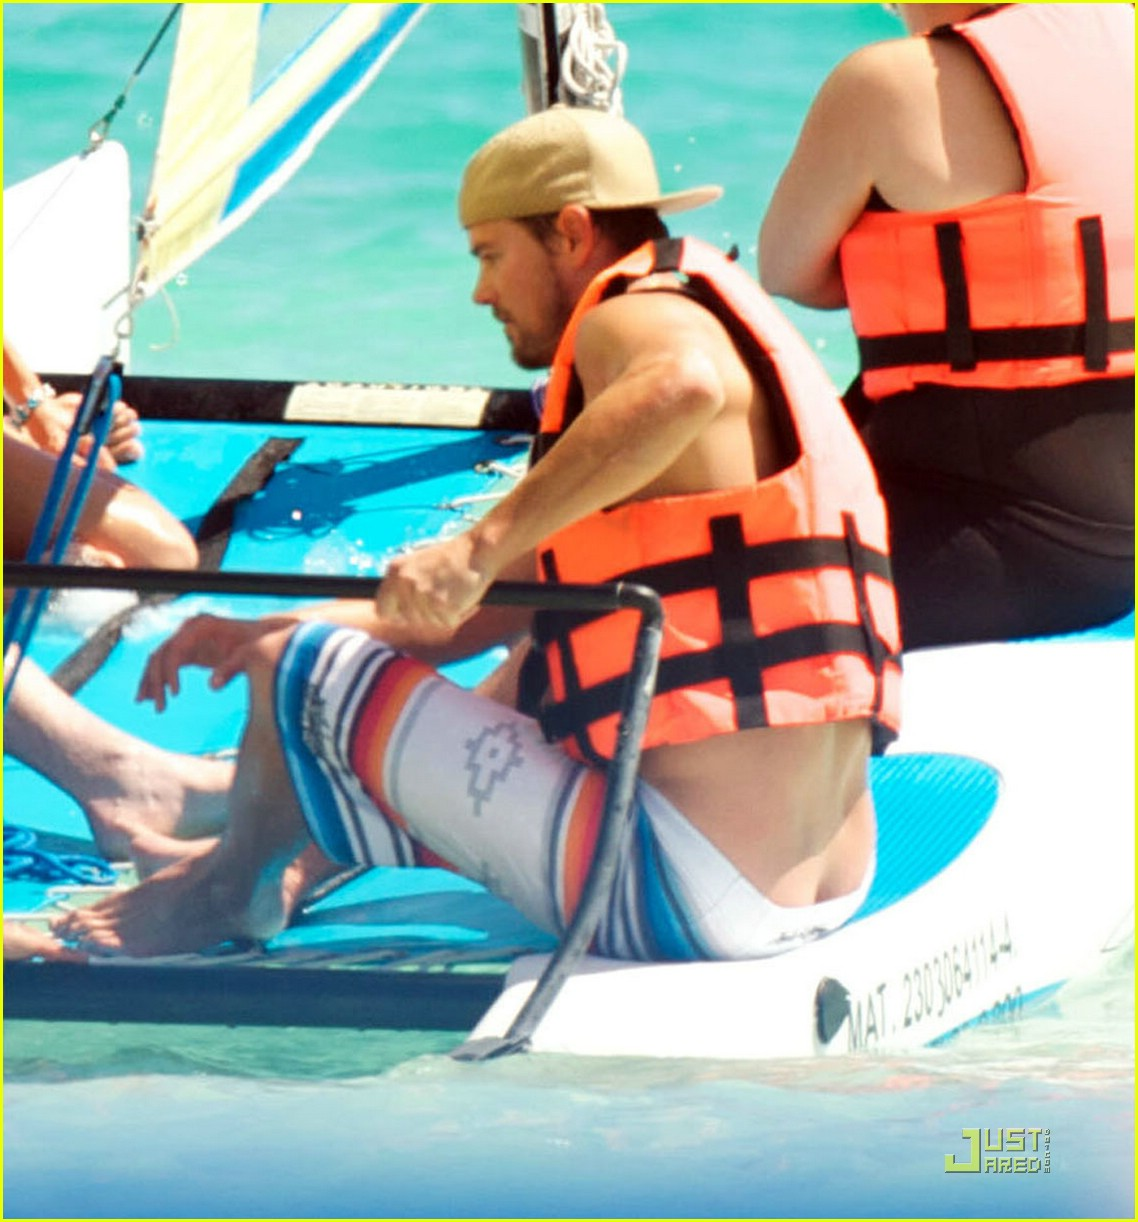 fergie josh duhamel sailboarding 011728431